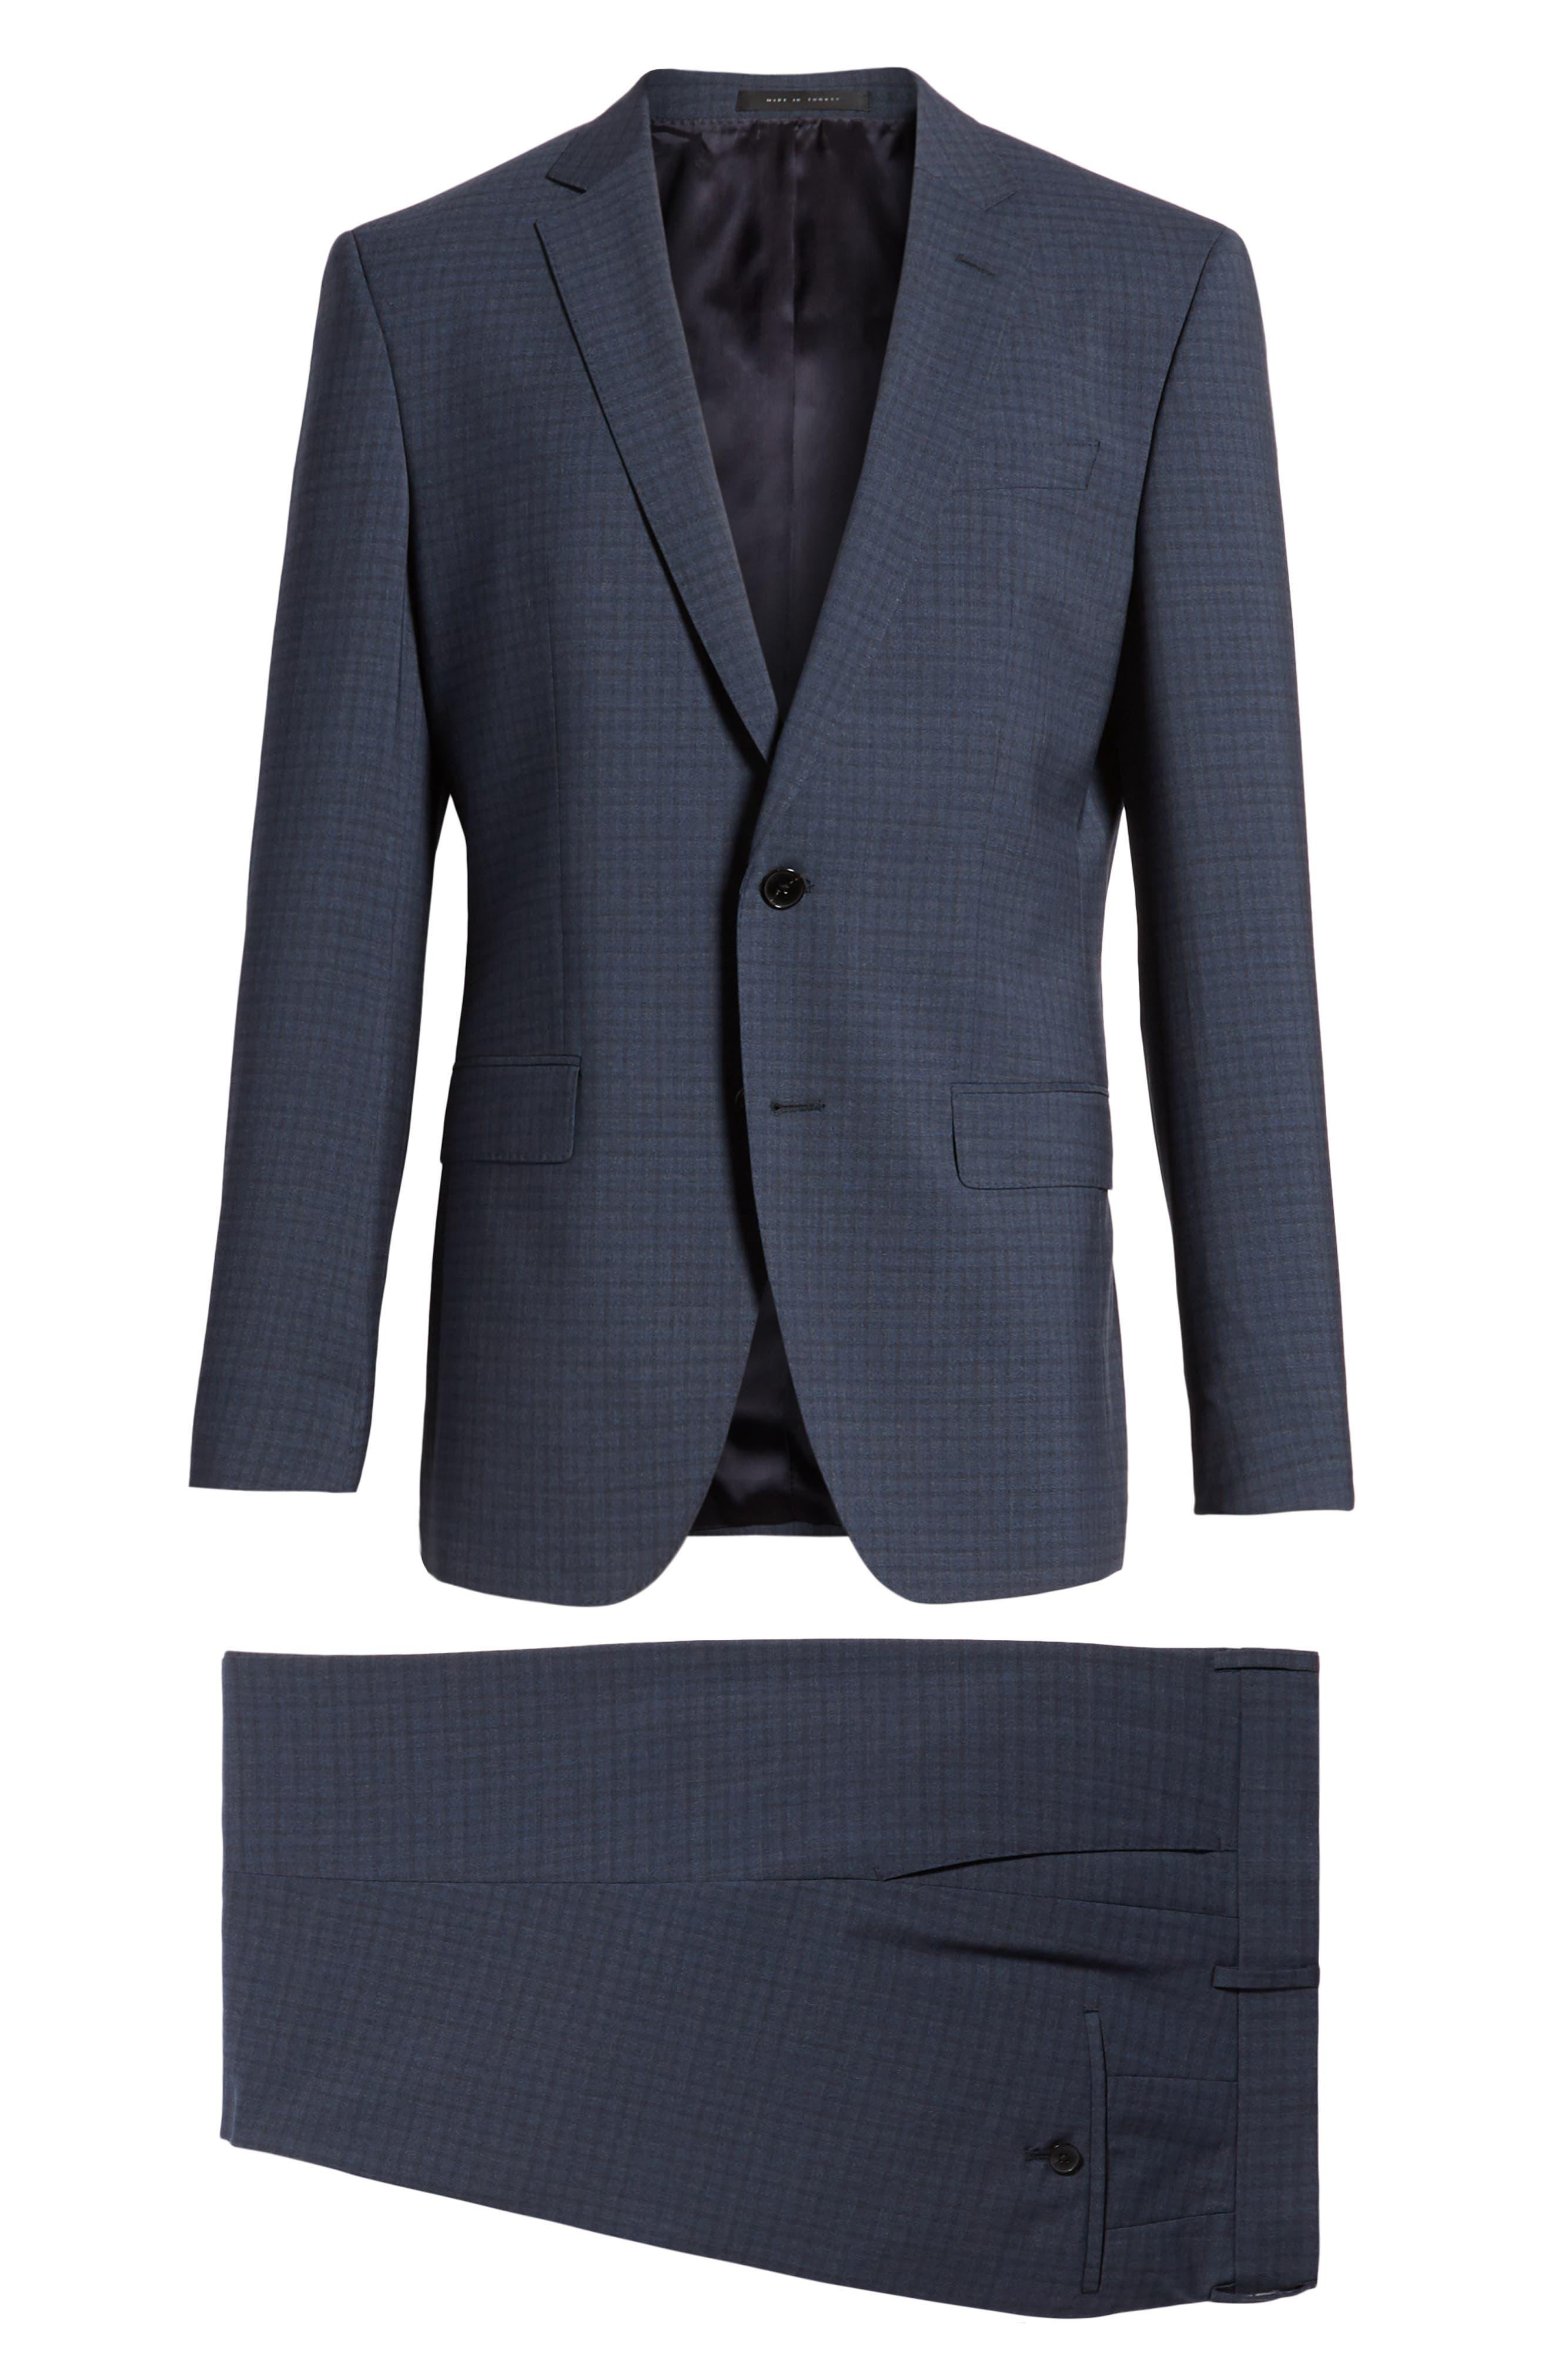 Huge/Genius Trim Fit Check Wool Suit,                             Alternate thumbnail 8, color,                             Blue/ Brown/ Charcoal